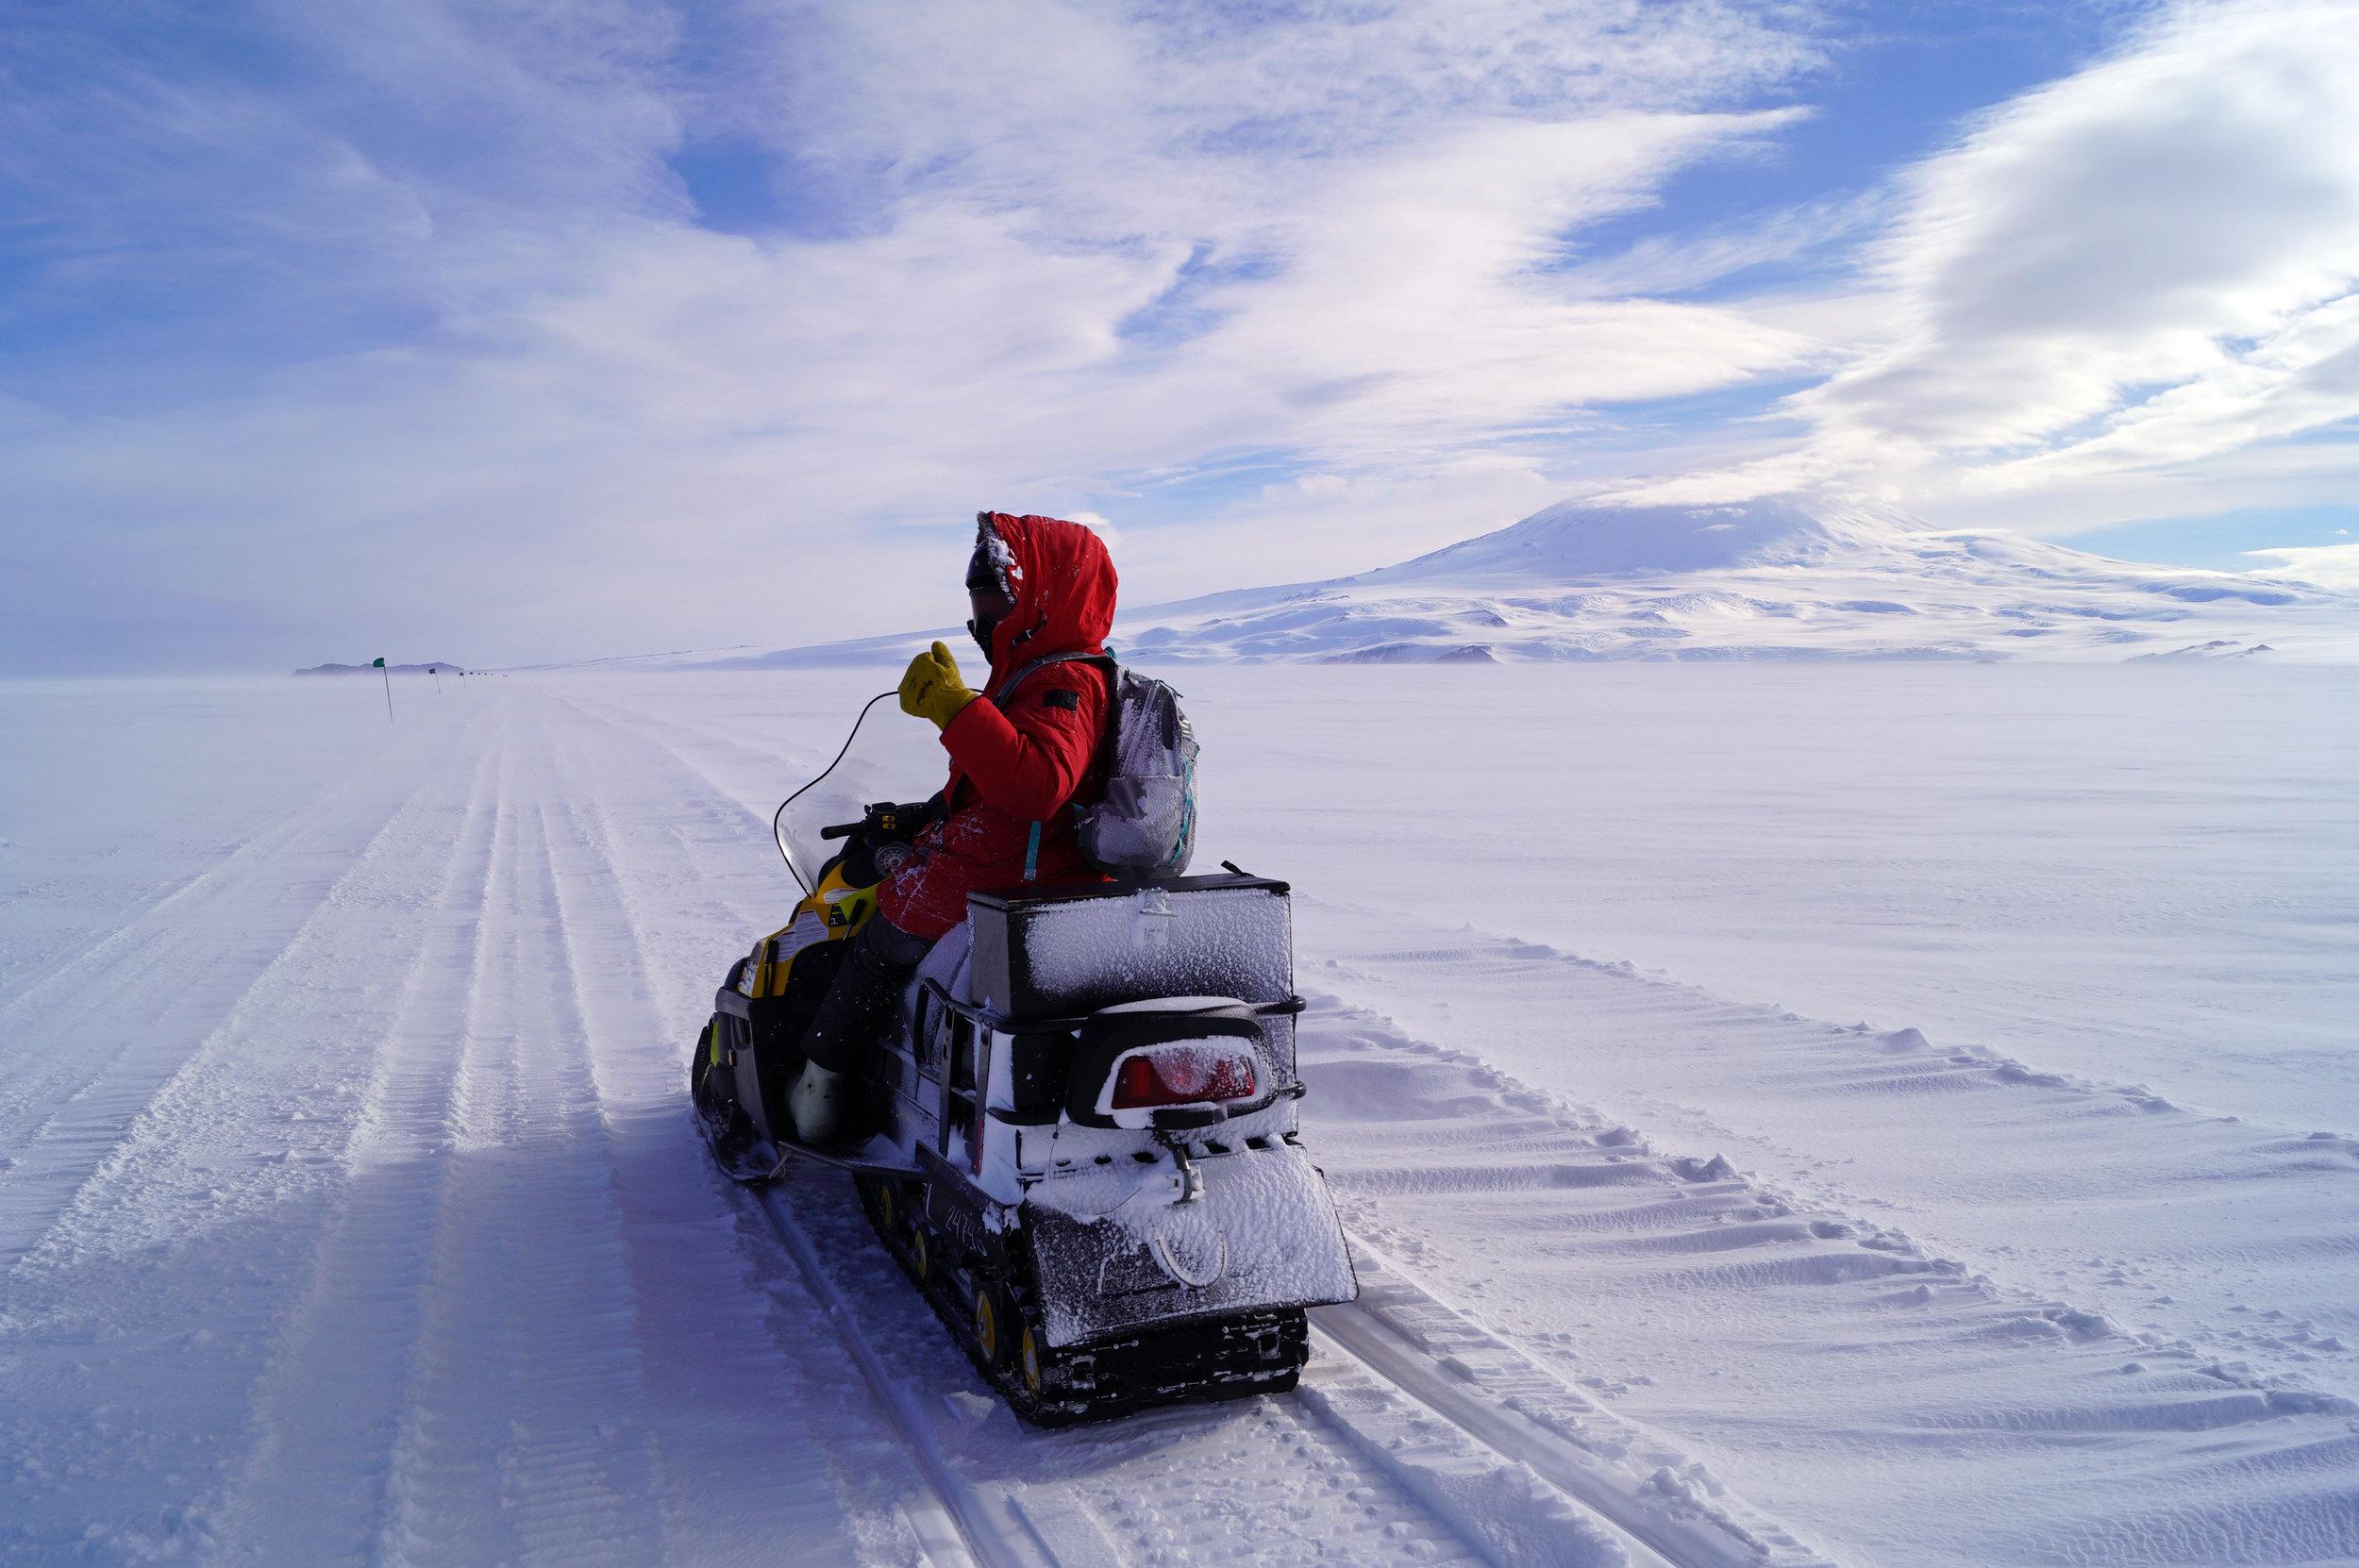 Snow machining on the sea ice. Photo credit: Elaine Hood.